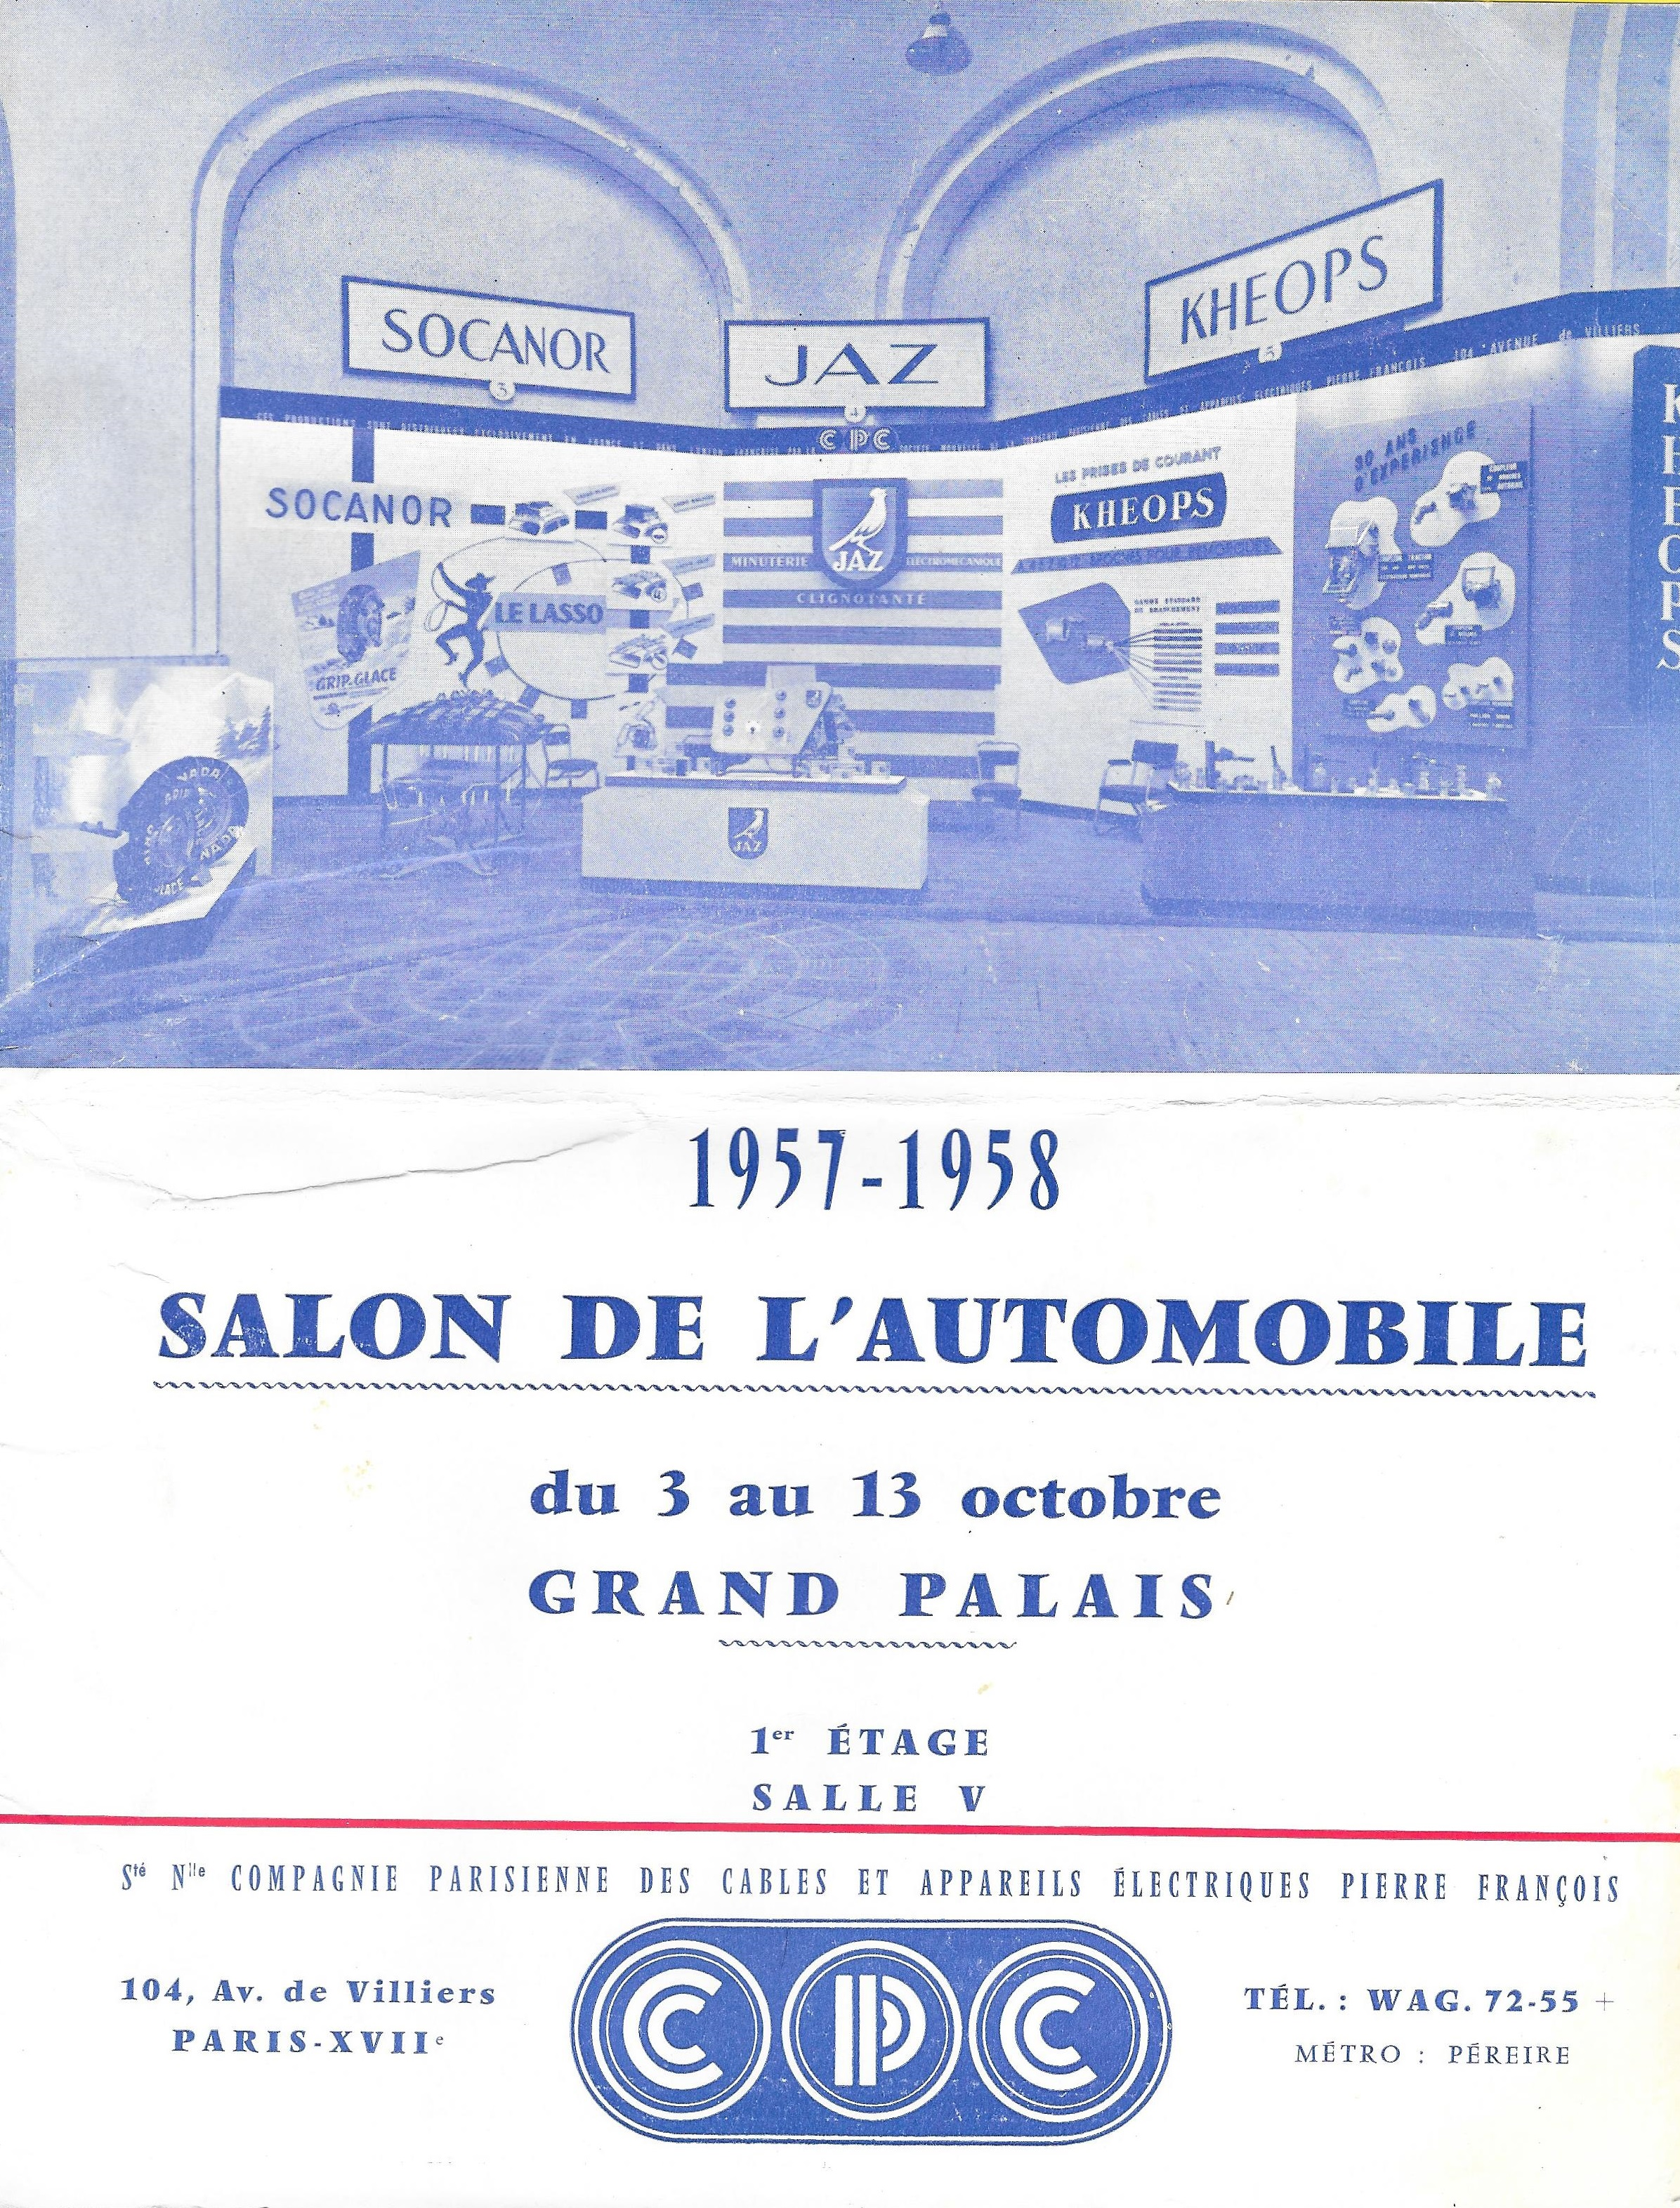 salon de l'auto 1957 1958 Jaz0001 (1)